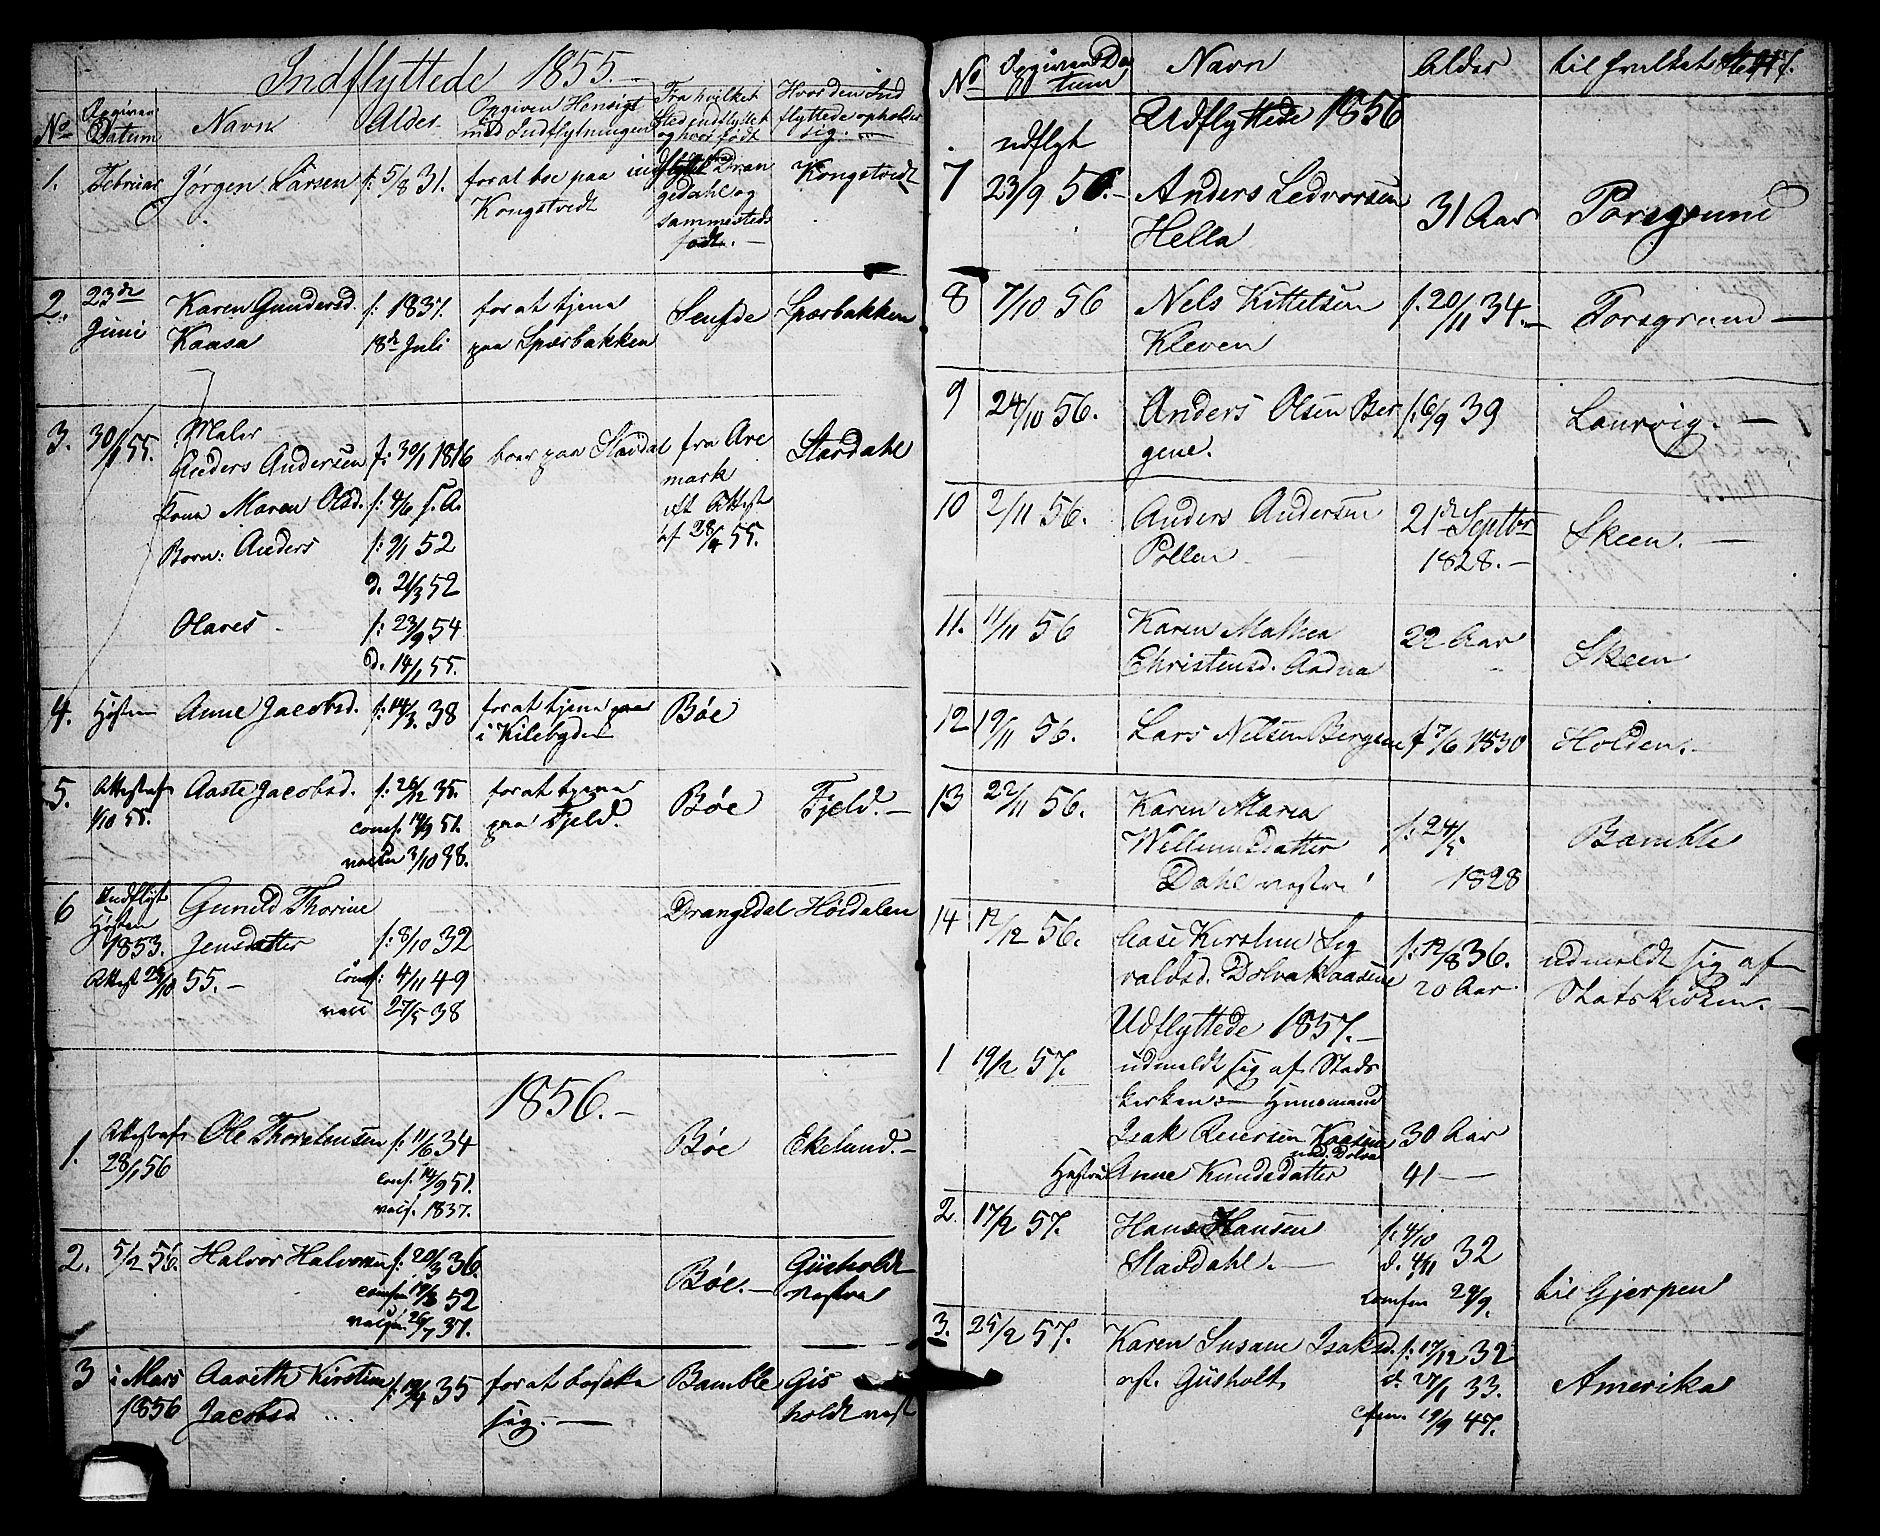 SAKO, Solum kirkebøker, G/Gb/L0001: Klokkerbok nr. II 1, 1848-1859, s. 117